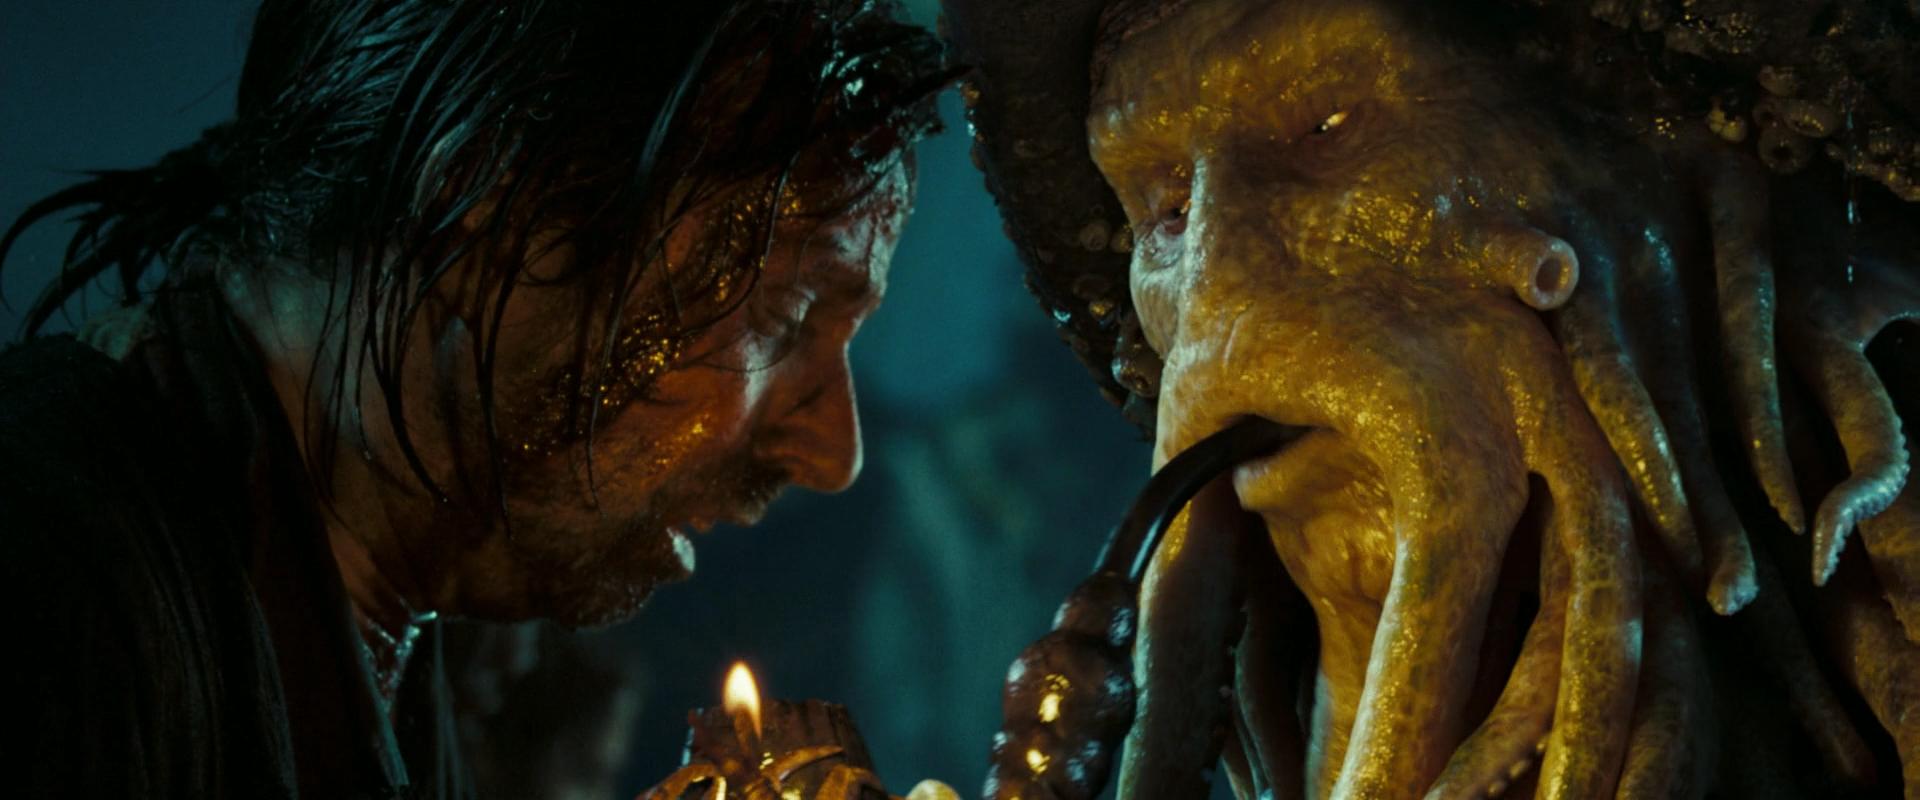 Pirates of the caribbean sex sceans nsfw movie